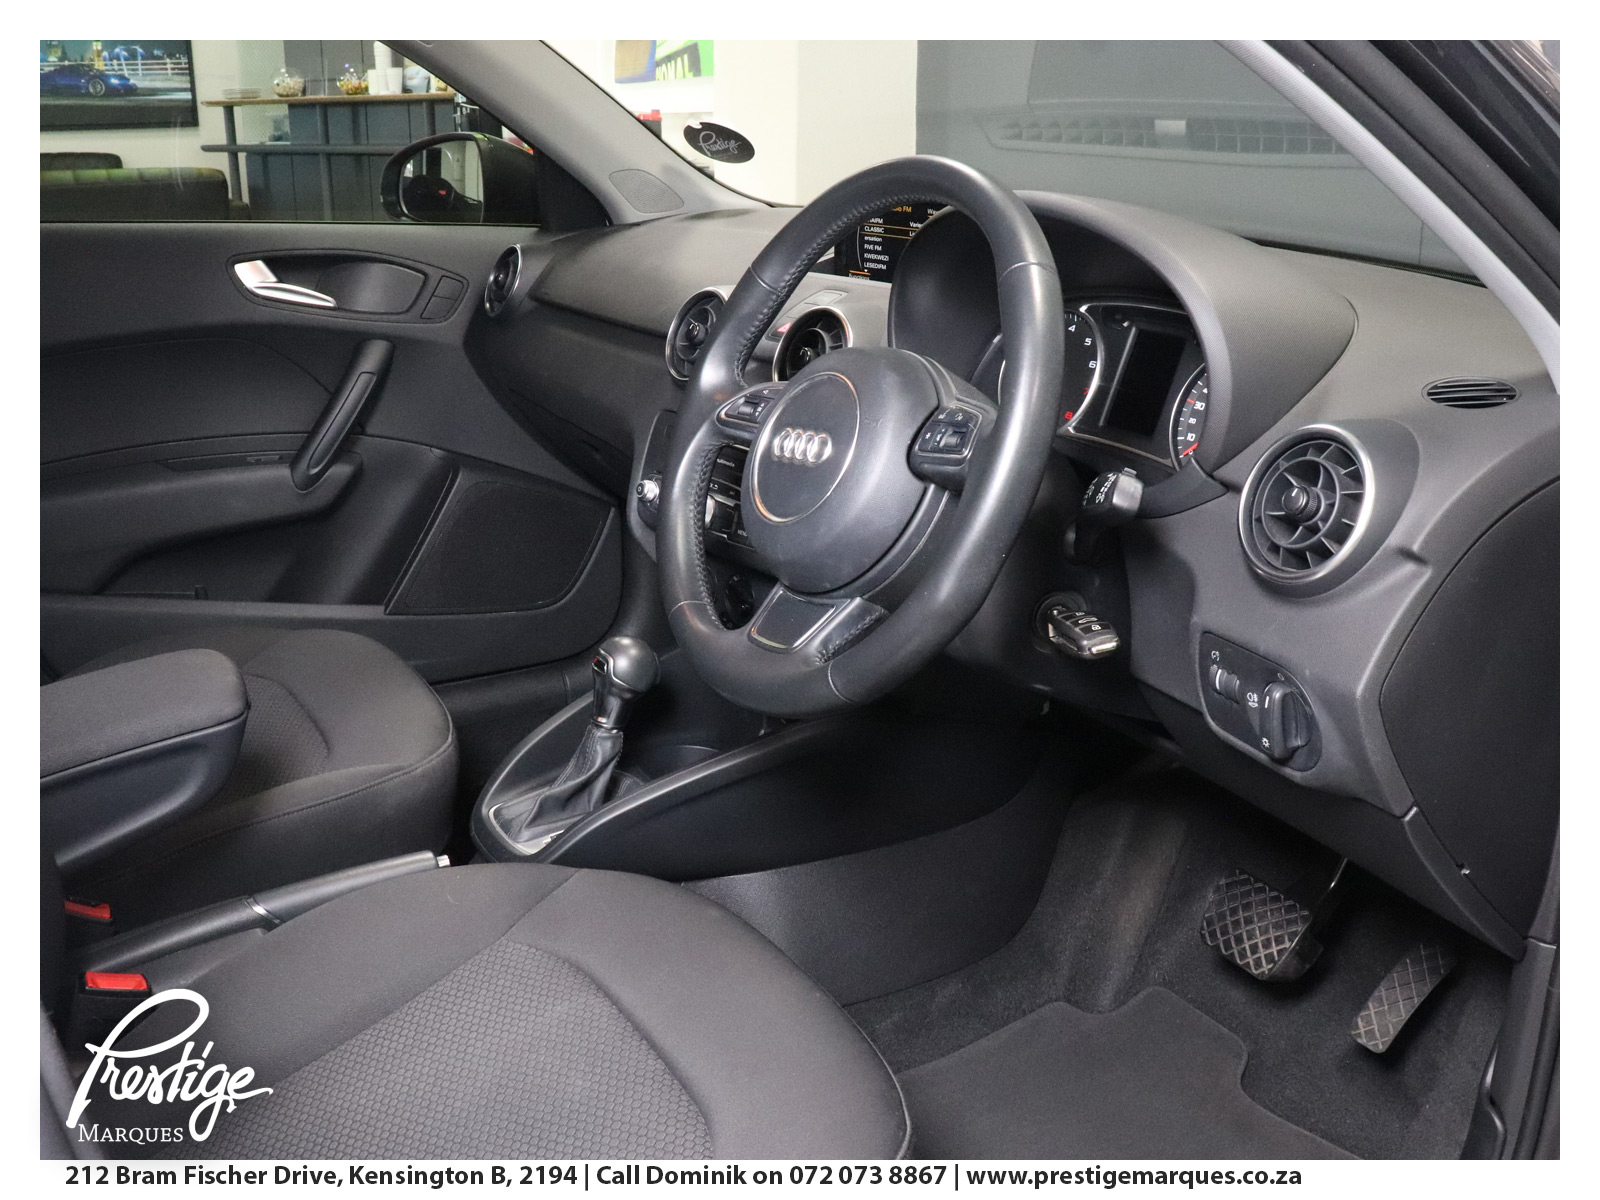 2015-Audi-A1-Prestige-Marques-Randburg-Sandton-10